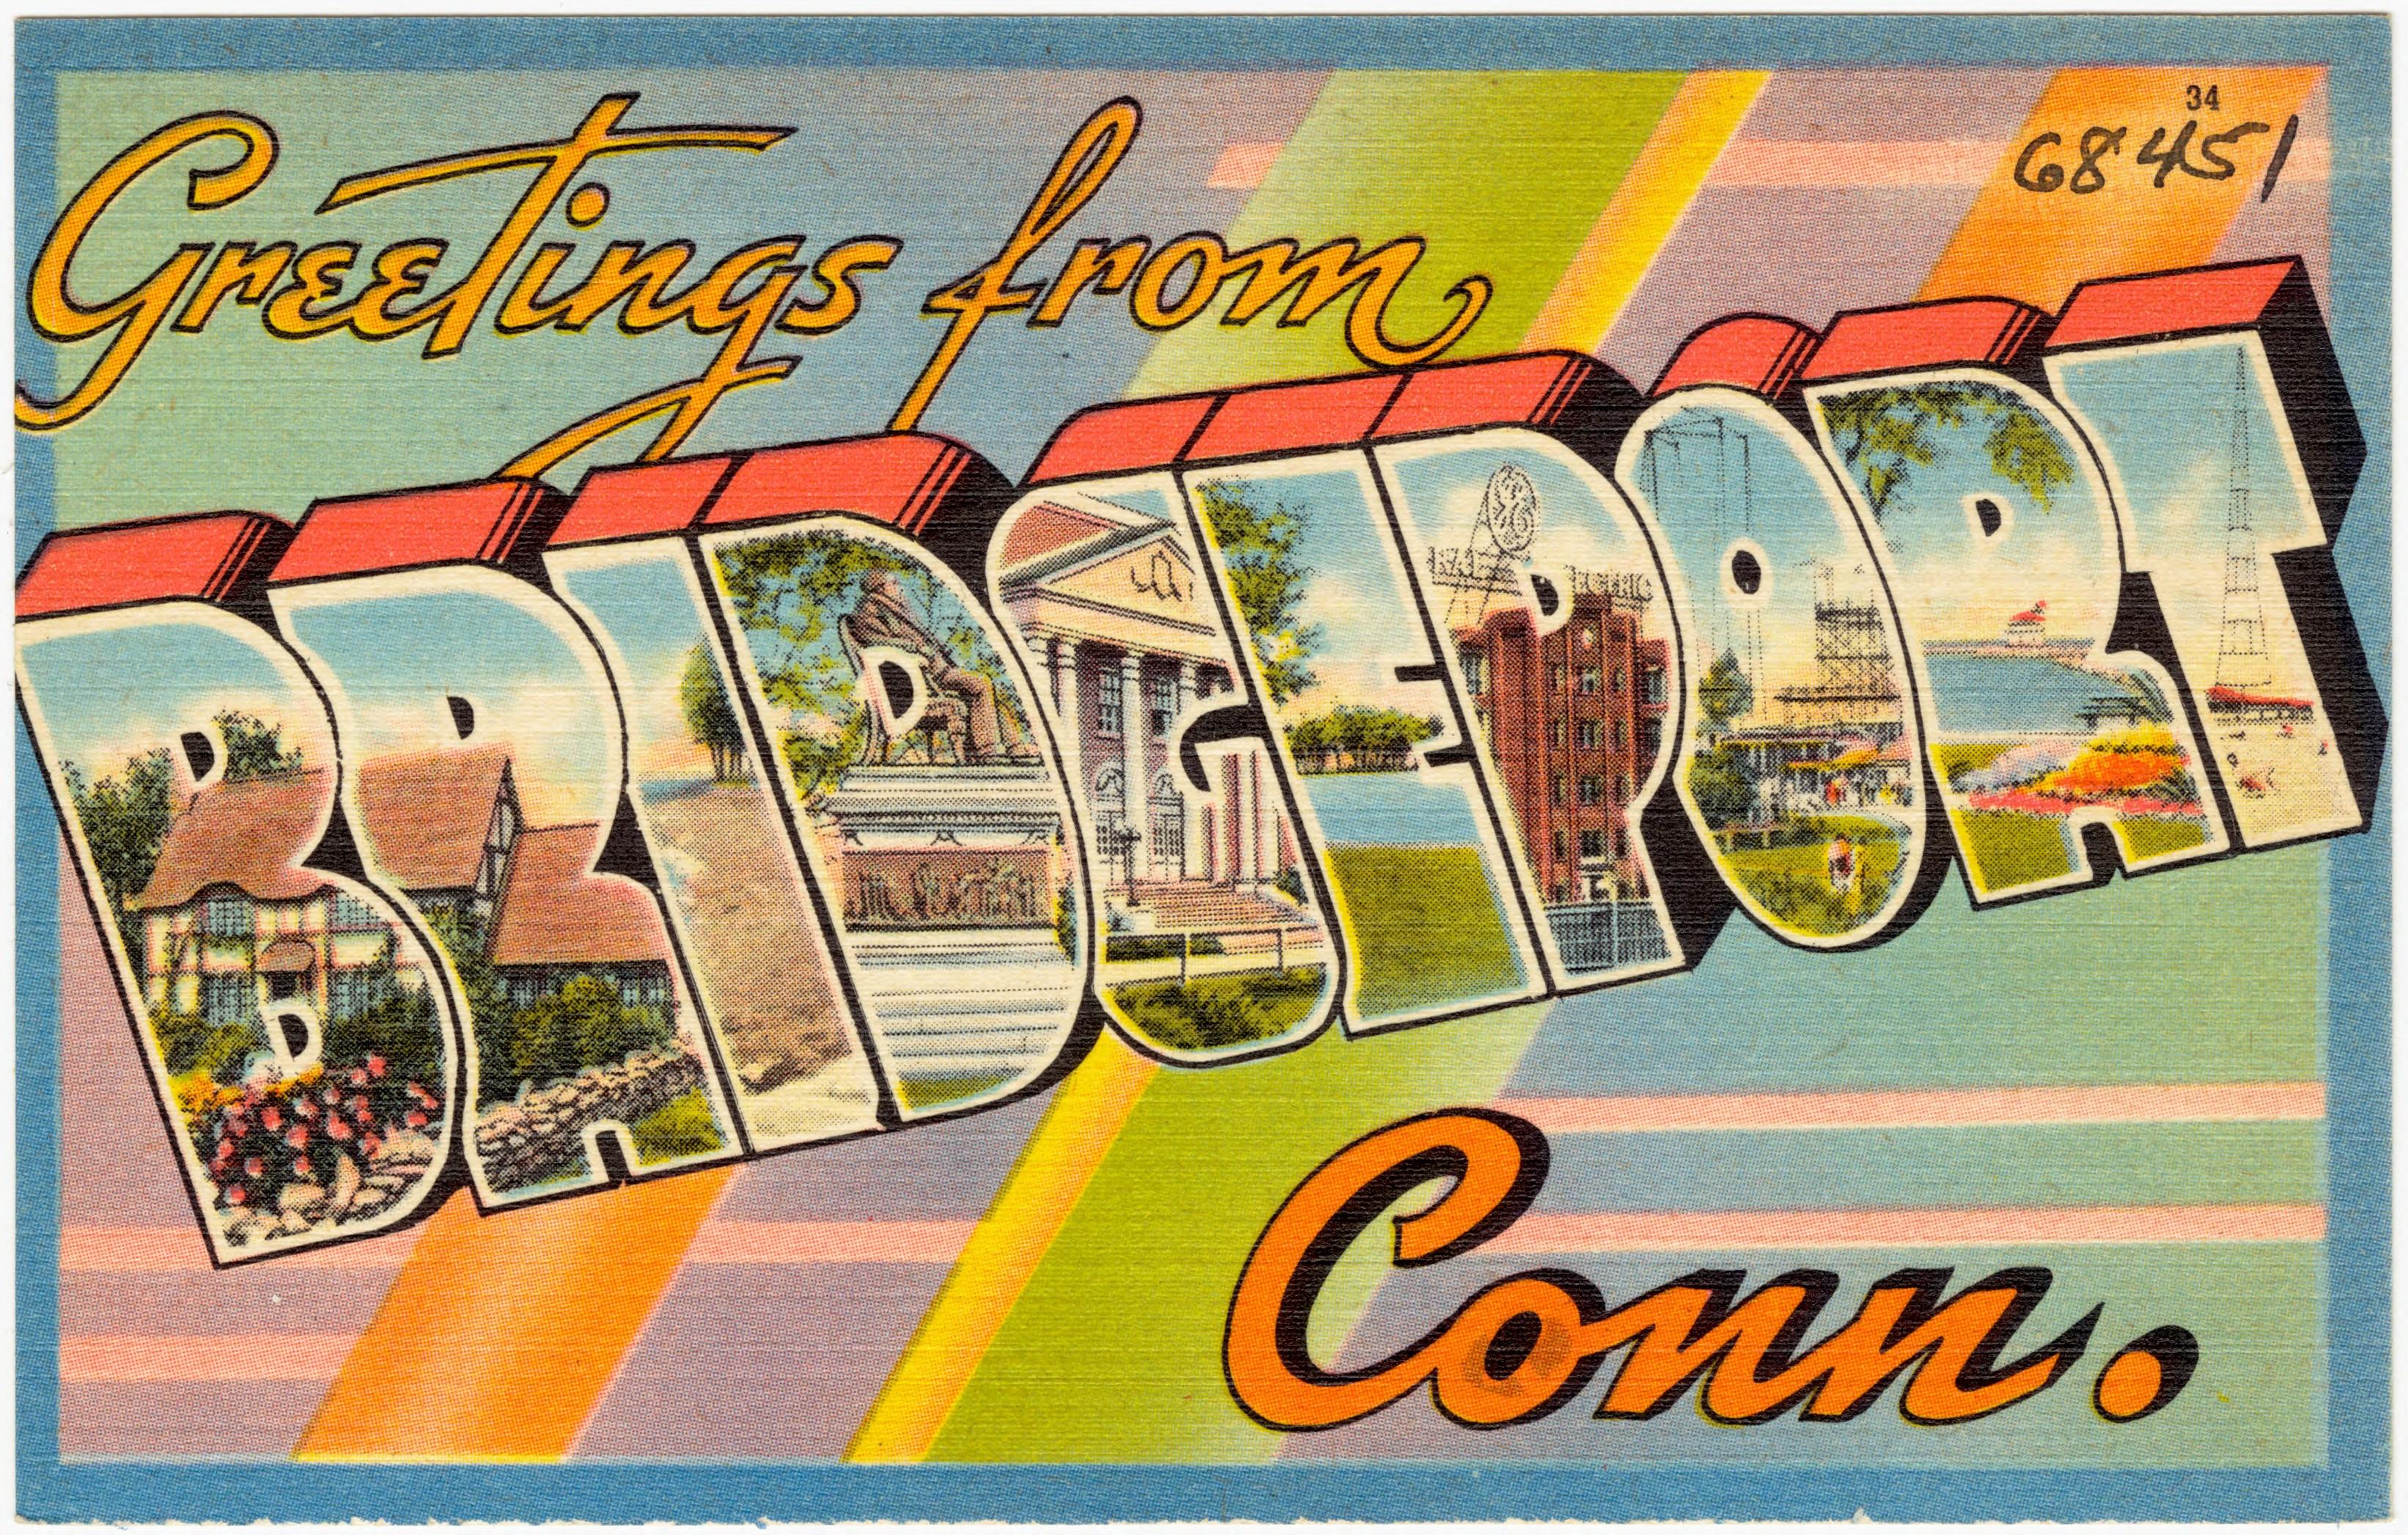 Filegreetings From Bridgeport Conn 68451g Wikimedia Commons